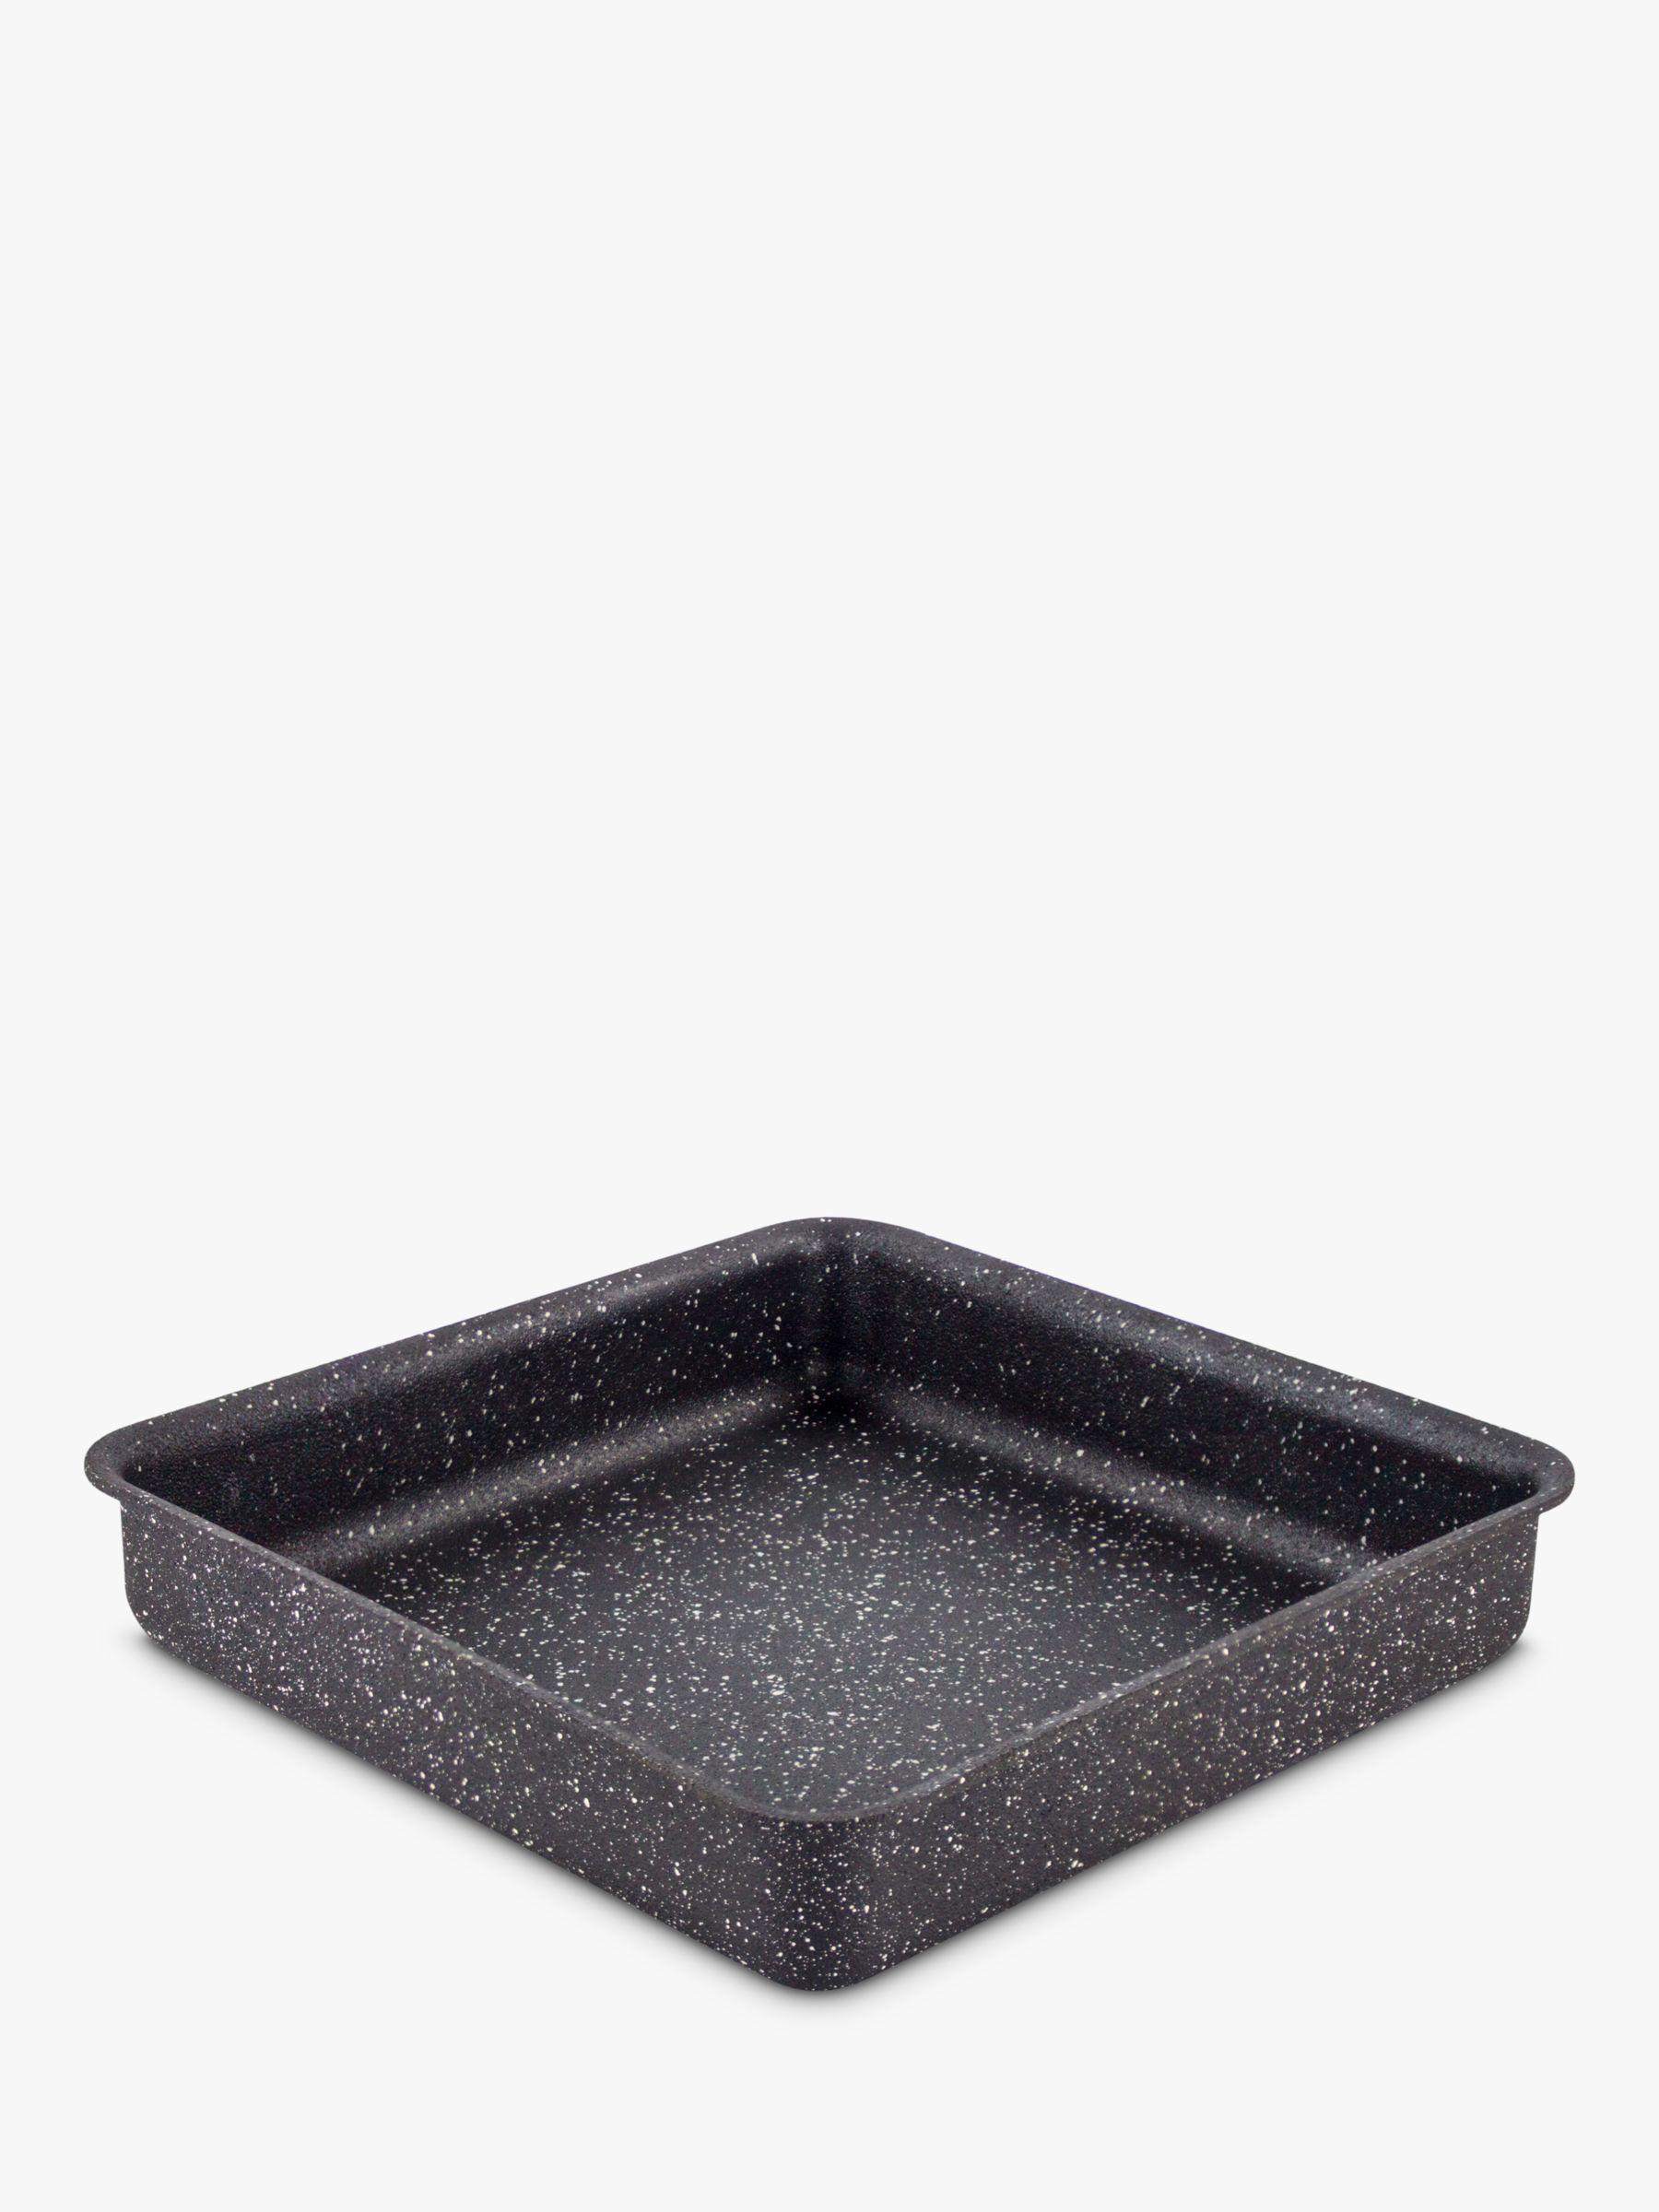 Eaziglide Eaziglide Neverstick2 Square Non-Stick Baking Tin, 23cm